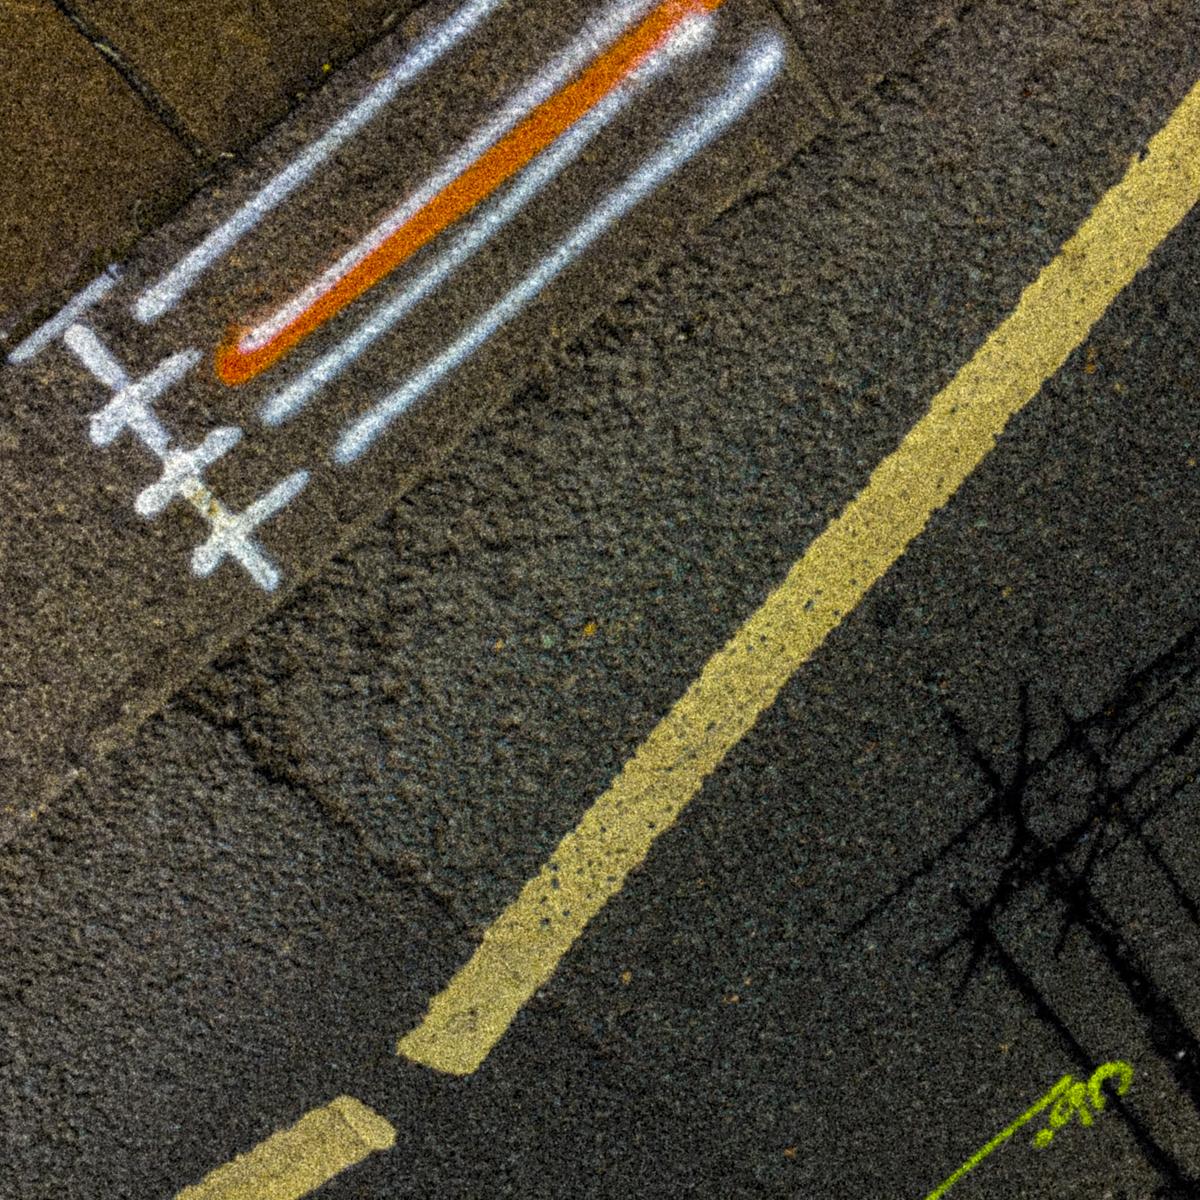 Oxford Street underfoot